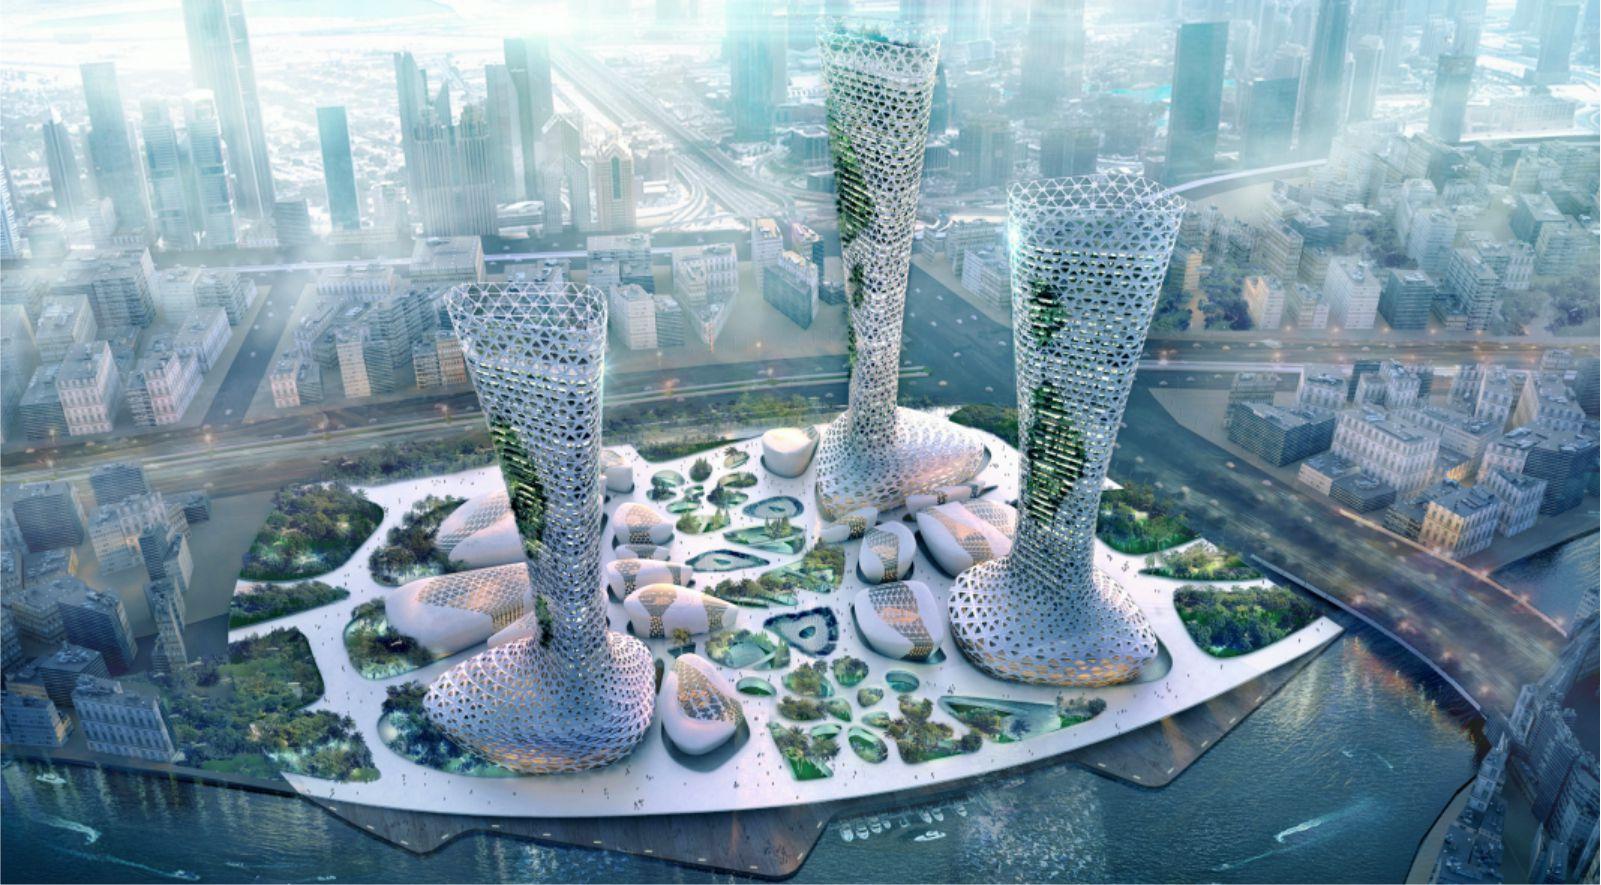 Symbiotic Towers